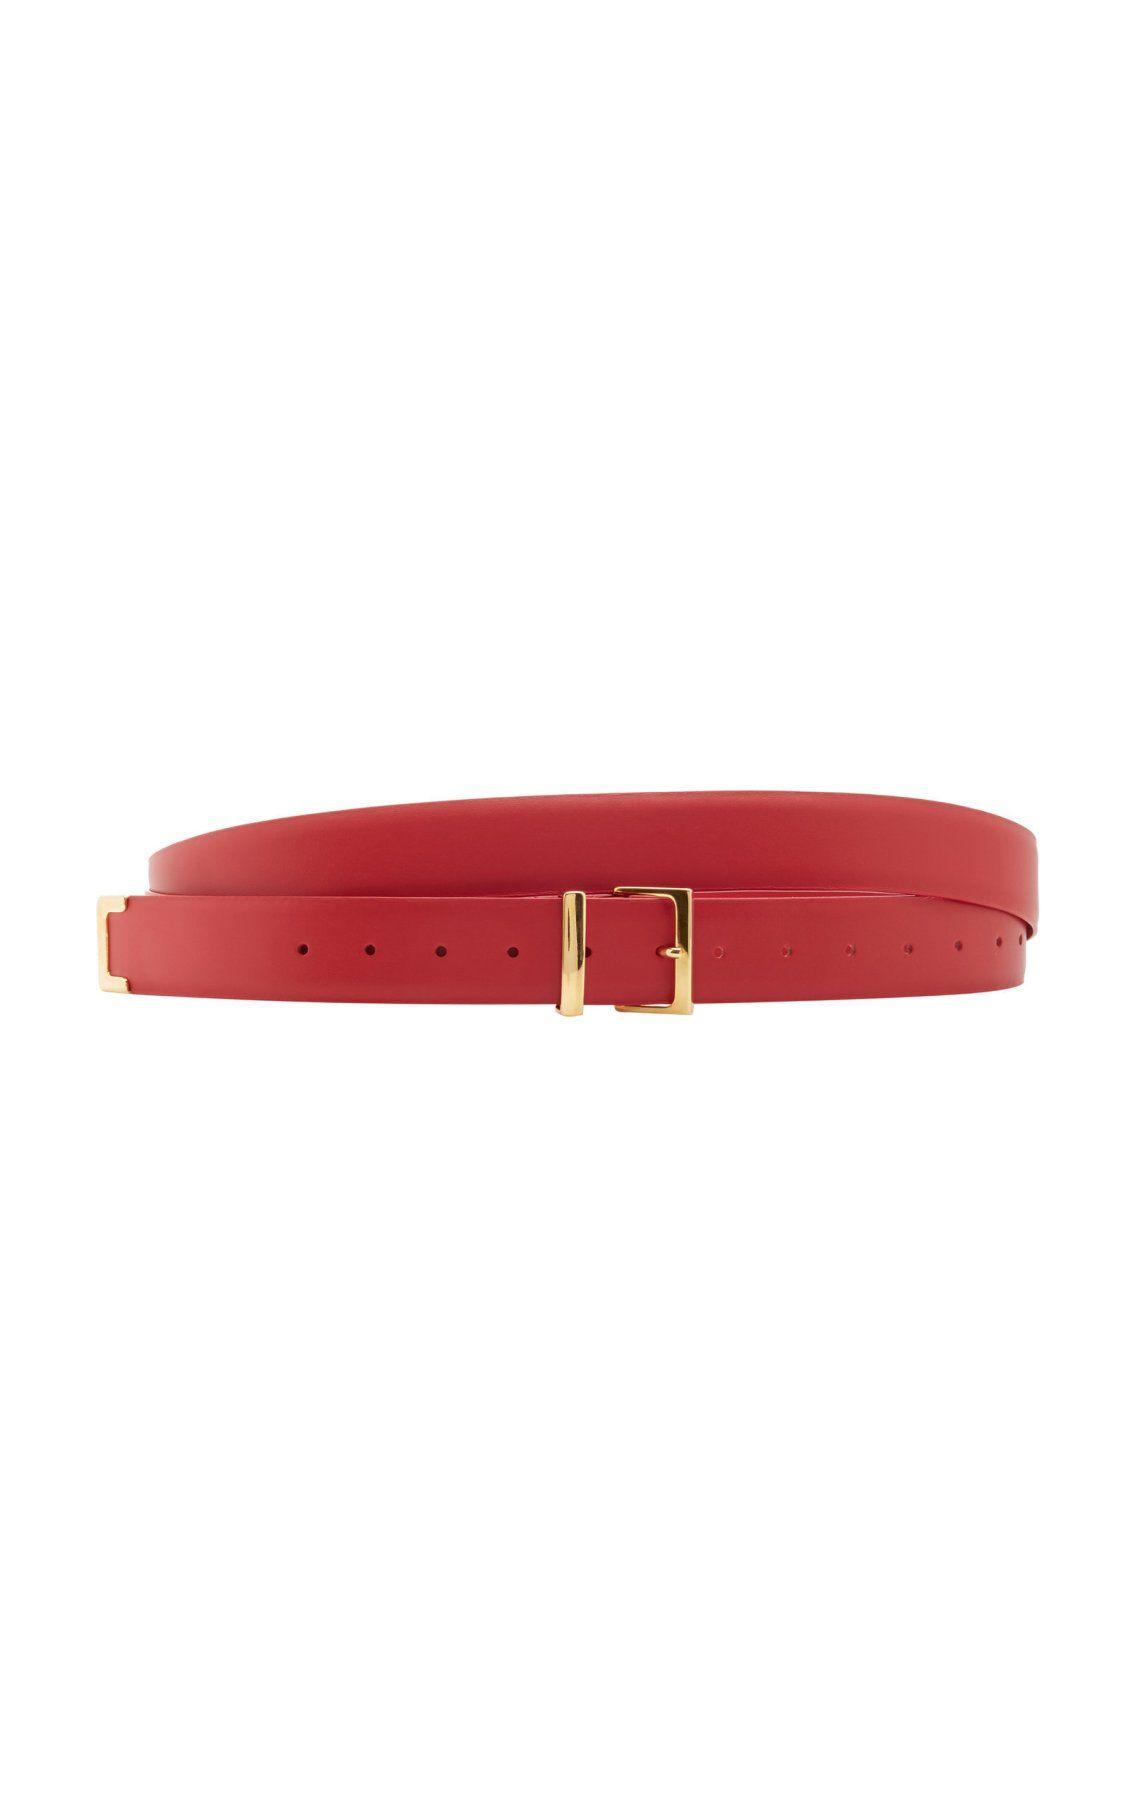 Moda Operandi Spring Summer 2020 Khaite Red Double Wrap Belt With Gold Buckle Double Wrap Belt Wrap Belt Belt